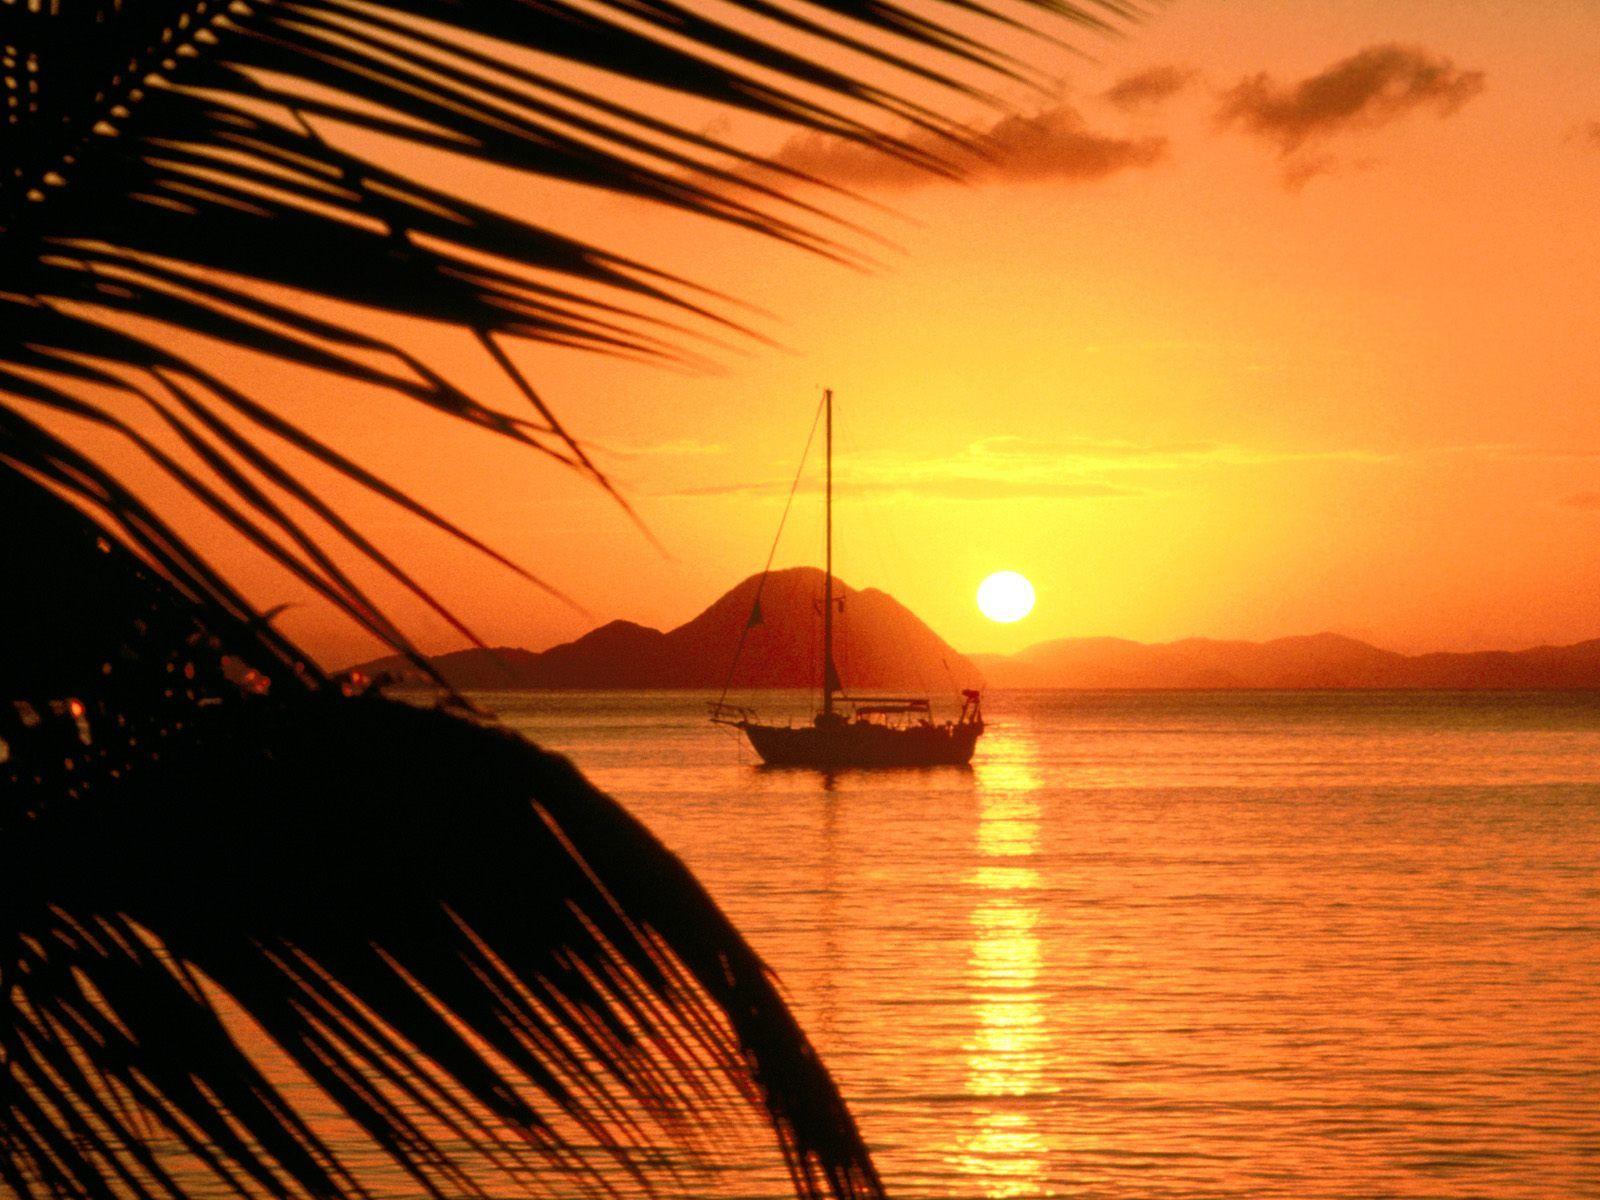 Free Beach Sunset Wallpaper - WallpaperSafari